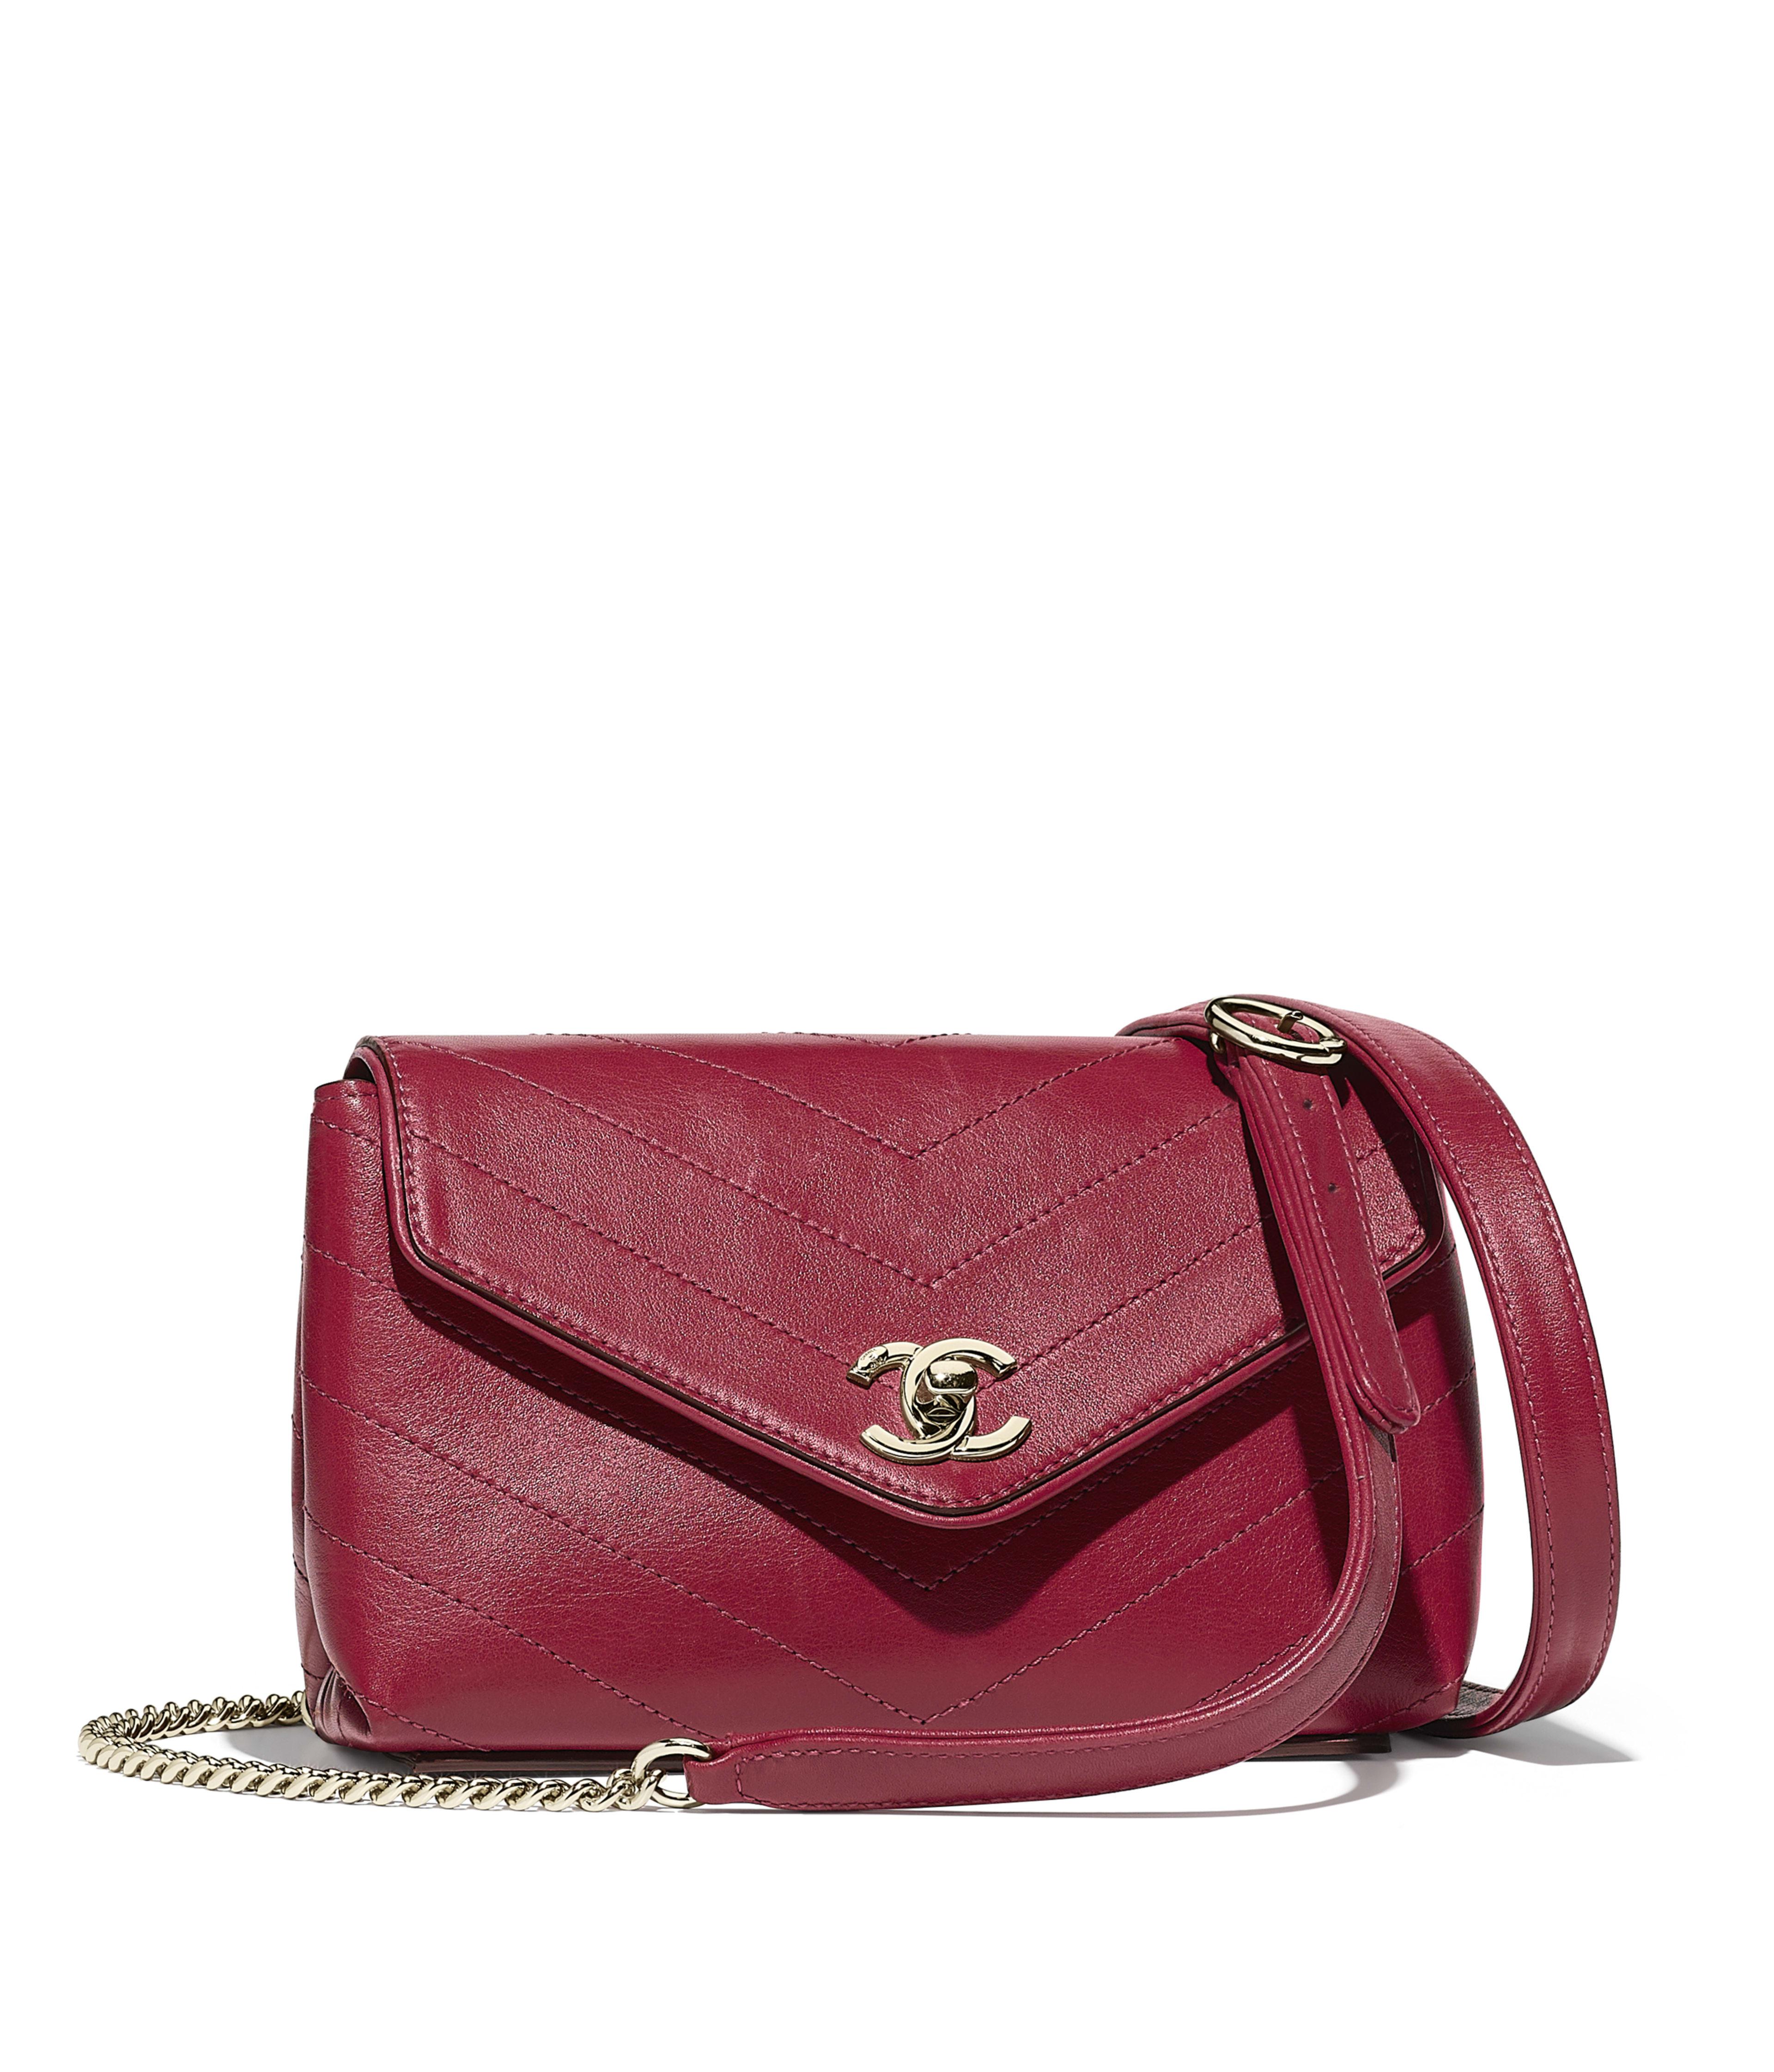 Waist Bag Calfskin Gold Tone Metal Pink Ref A57592y838355b309